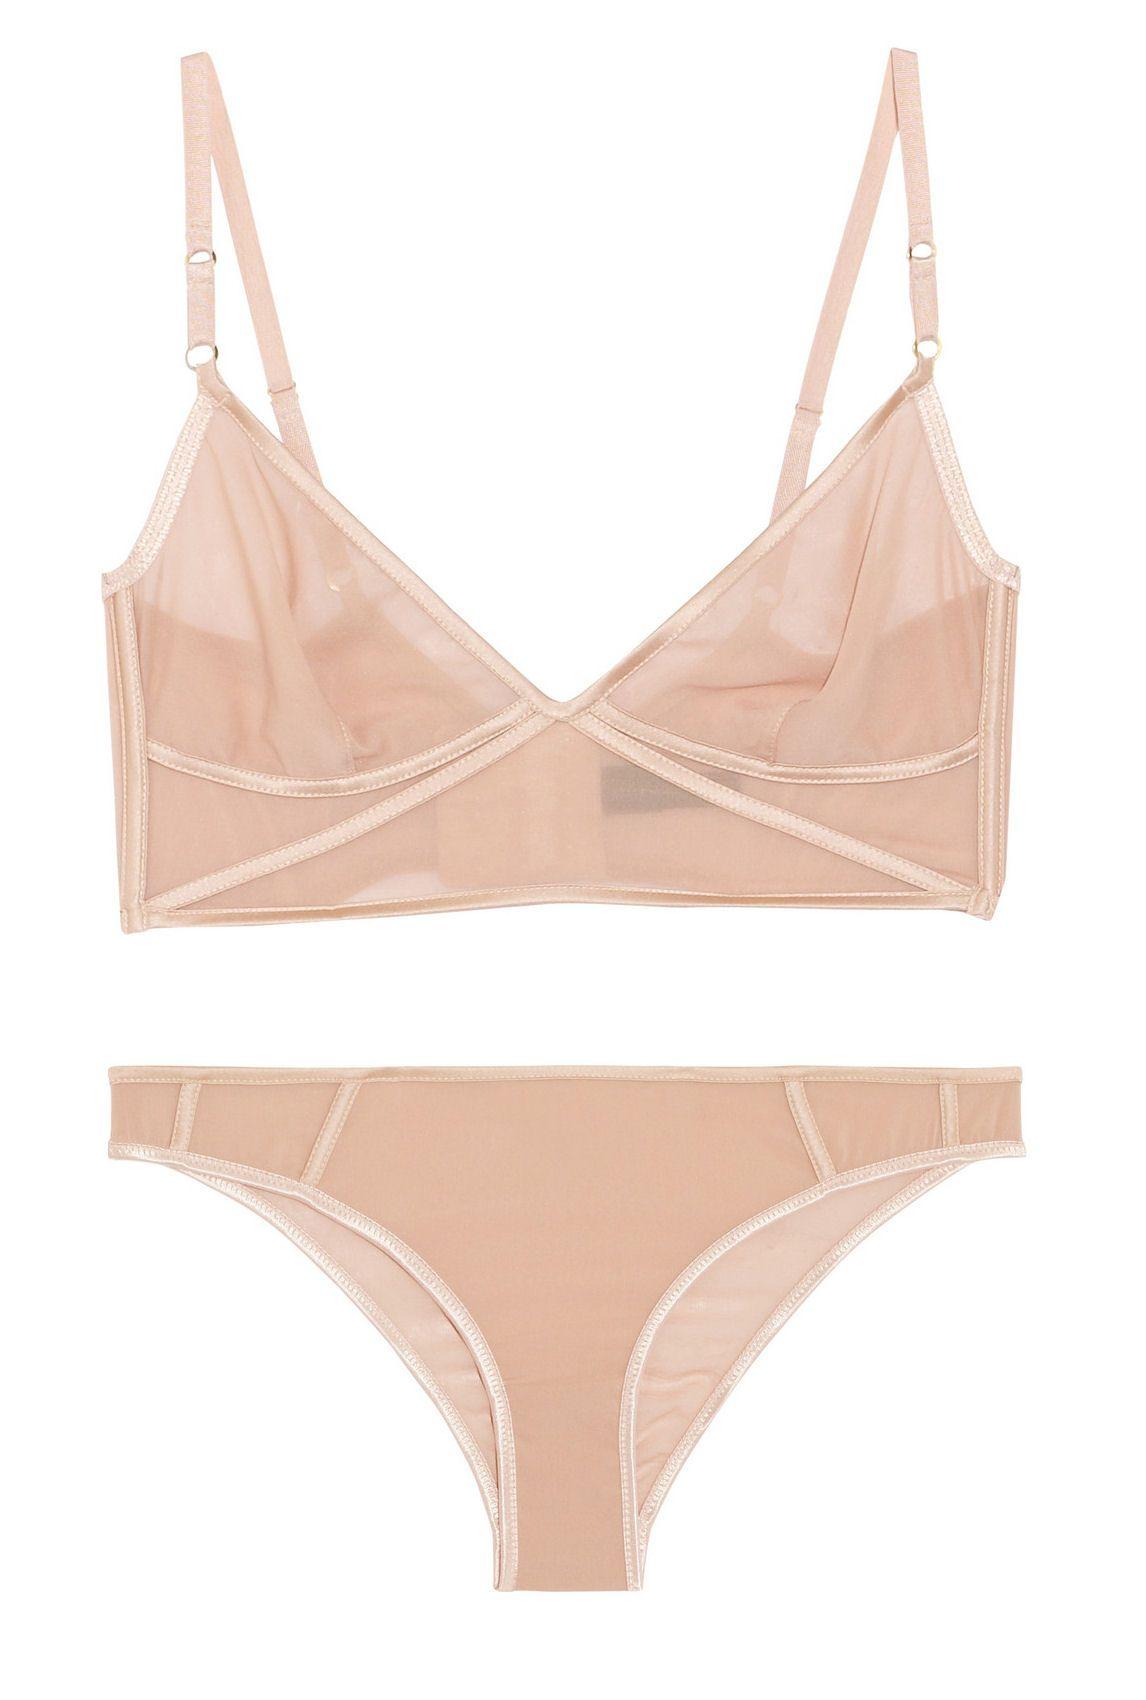 KIKI DE MONTPARNASSE Sheer Taped stretch-silk chiffon soft cup bra and briefs